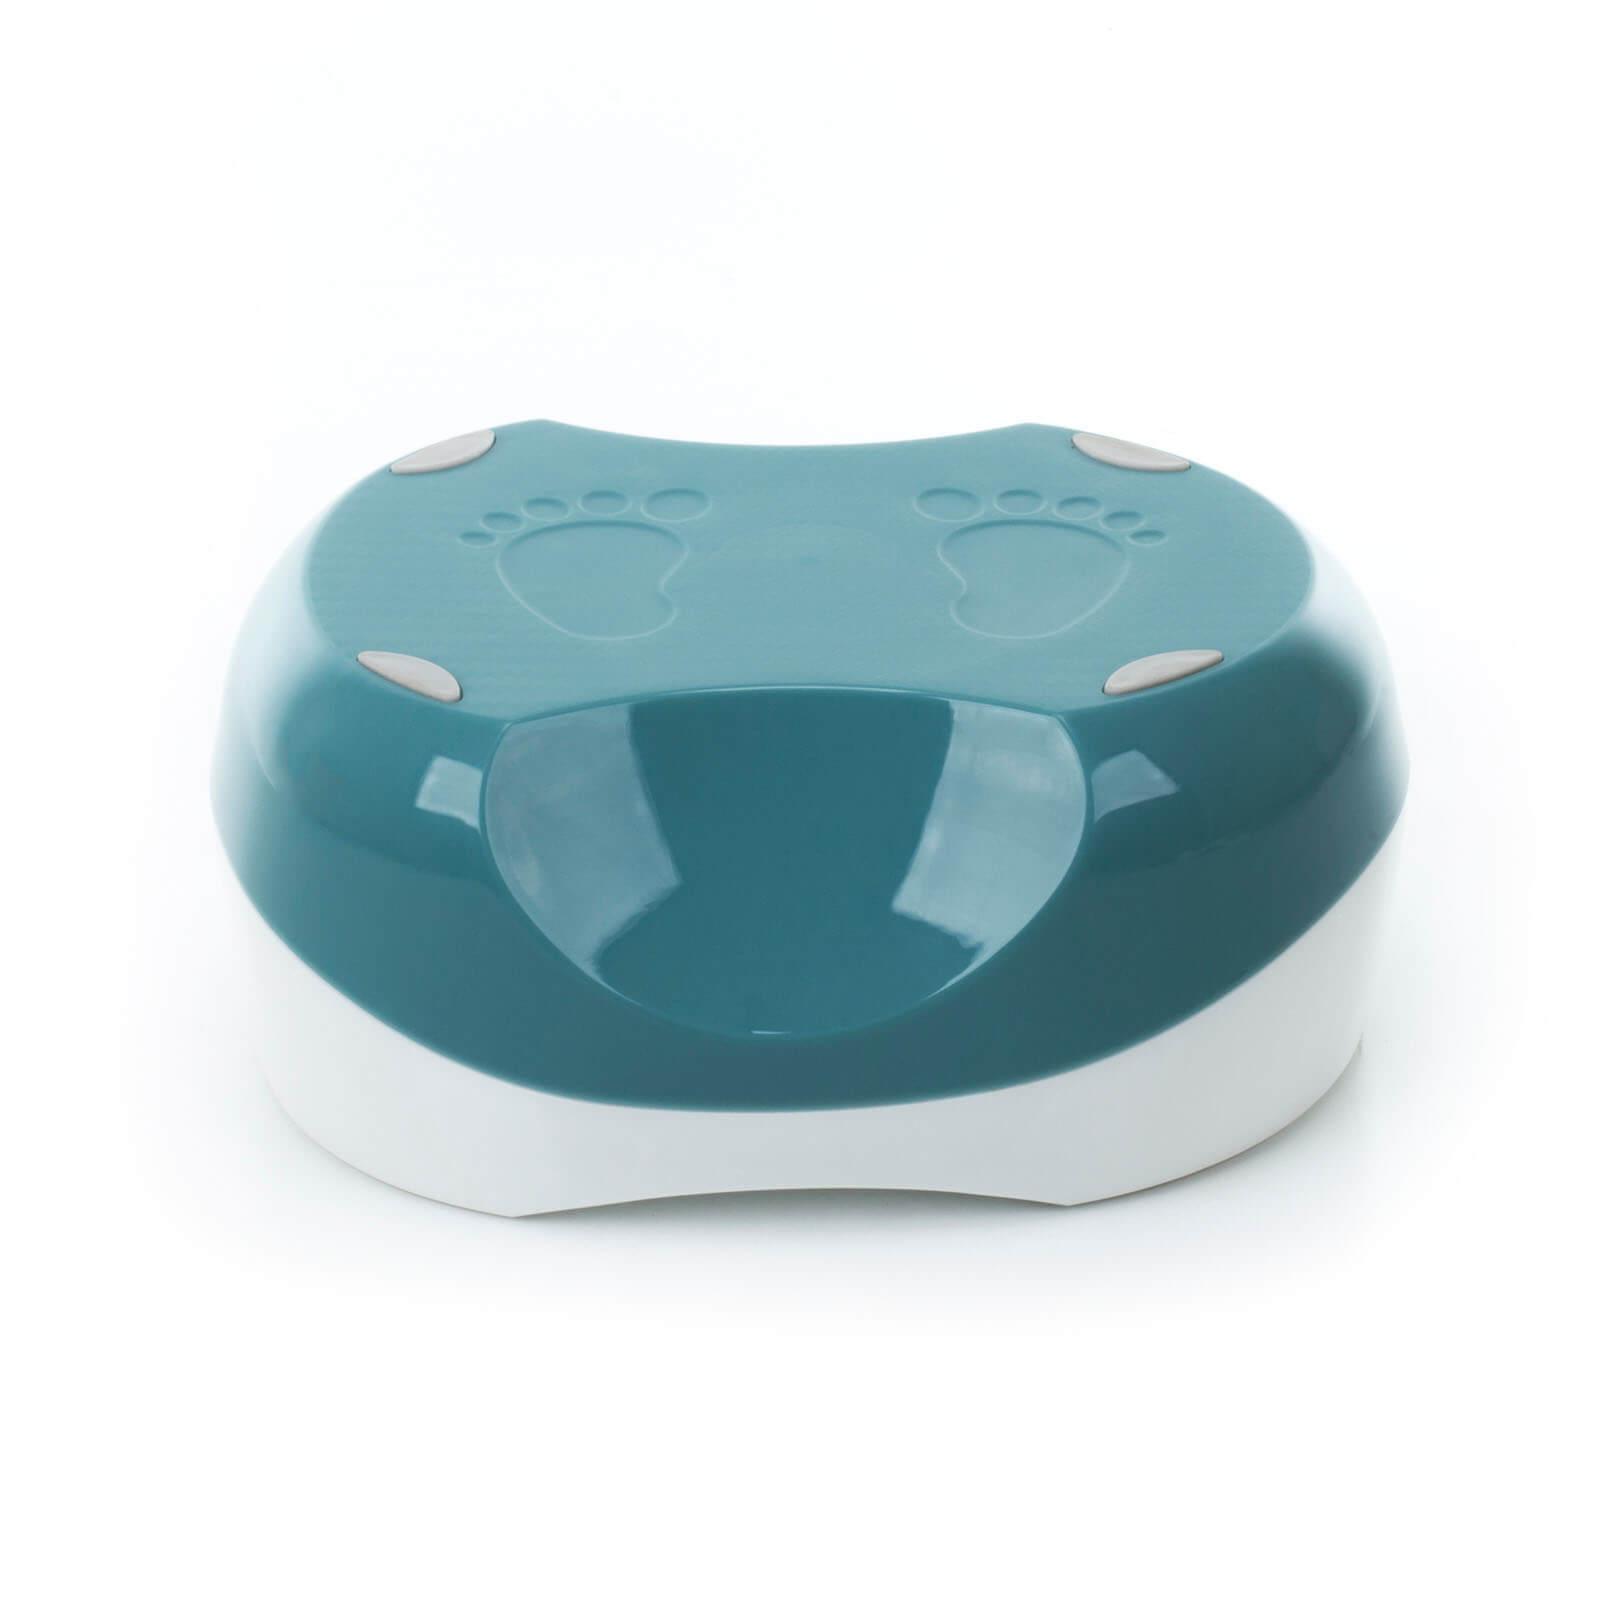 Troninho Flex Potty 3 in 1 Safety 1st - Azul